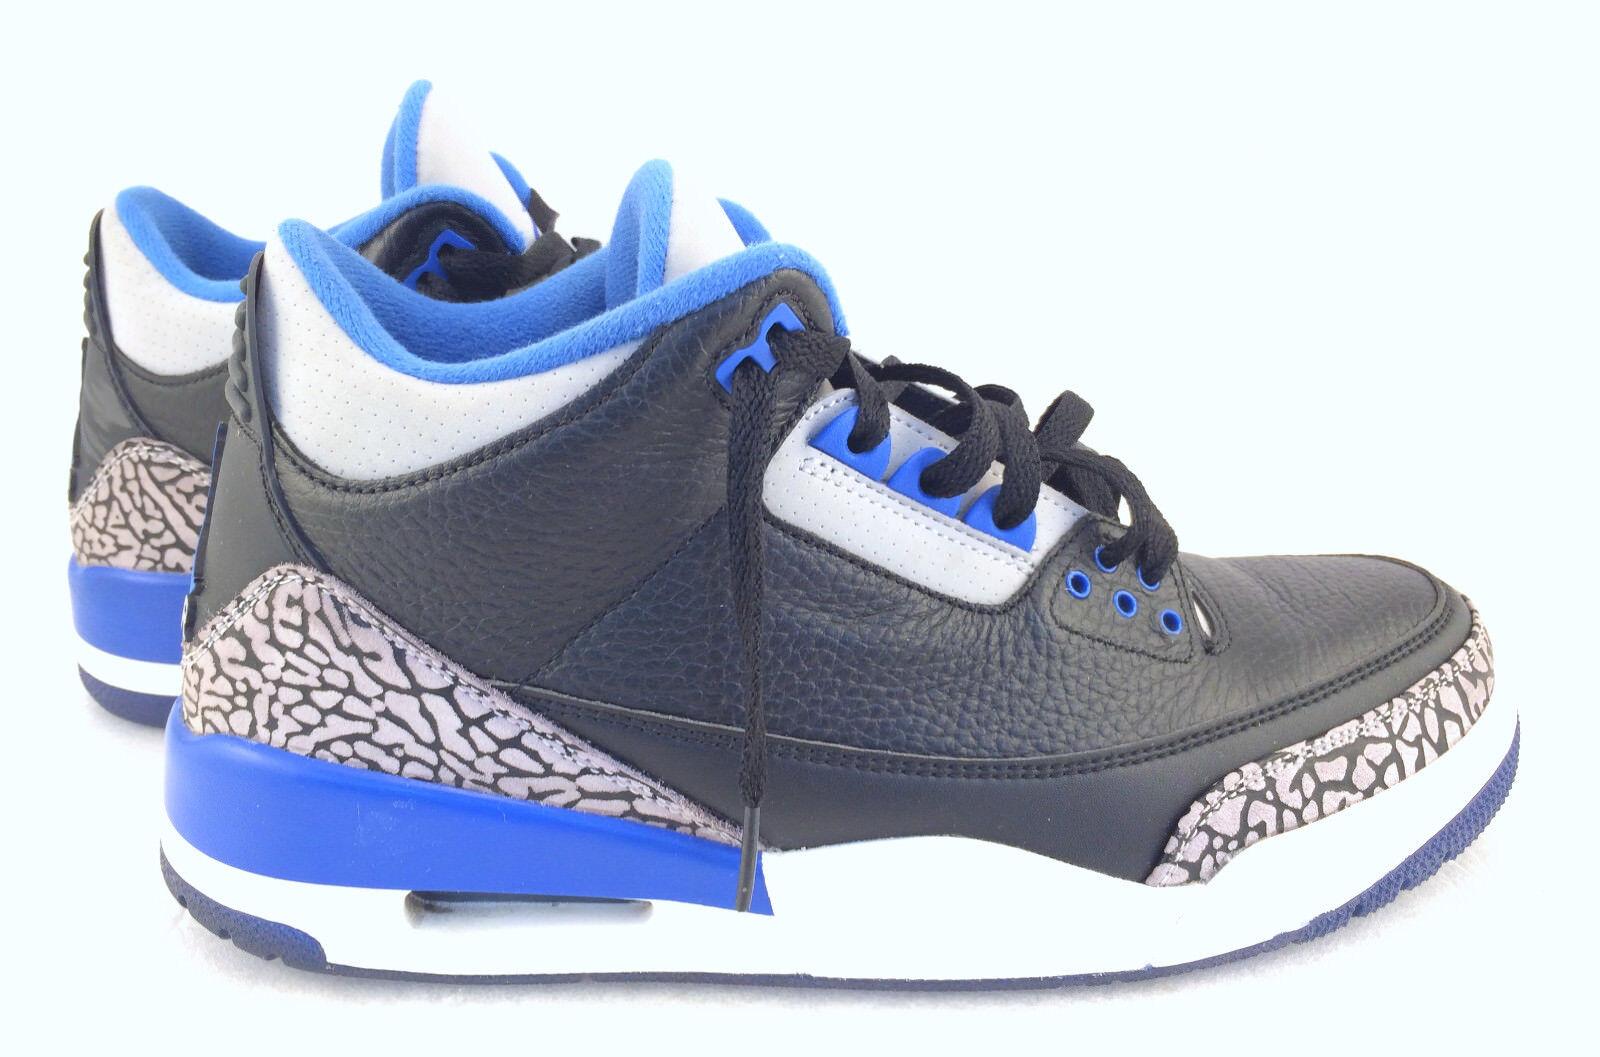 new concept 2c89e 3122b ... buy nike air jordan 3 retro black sport blue wolf grey 136064 007 size  10 9b513